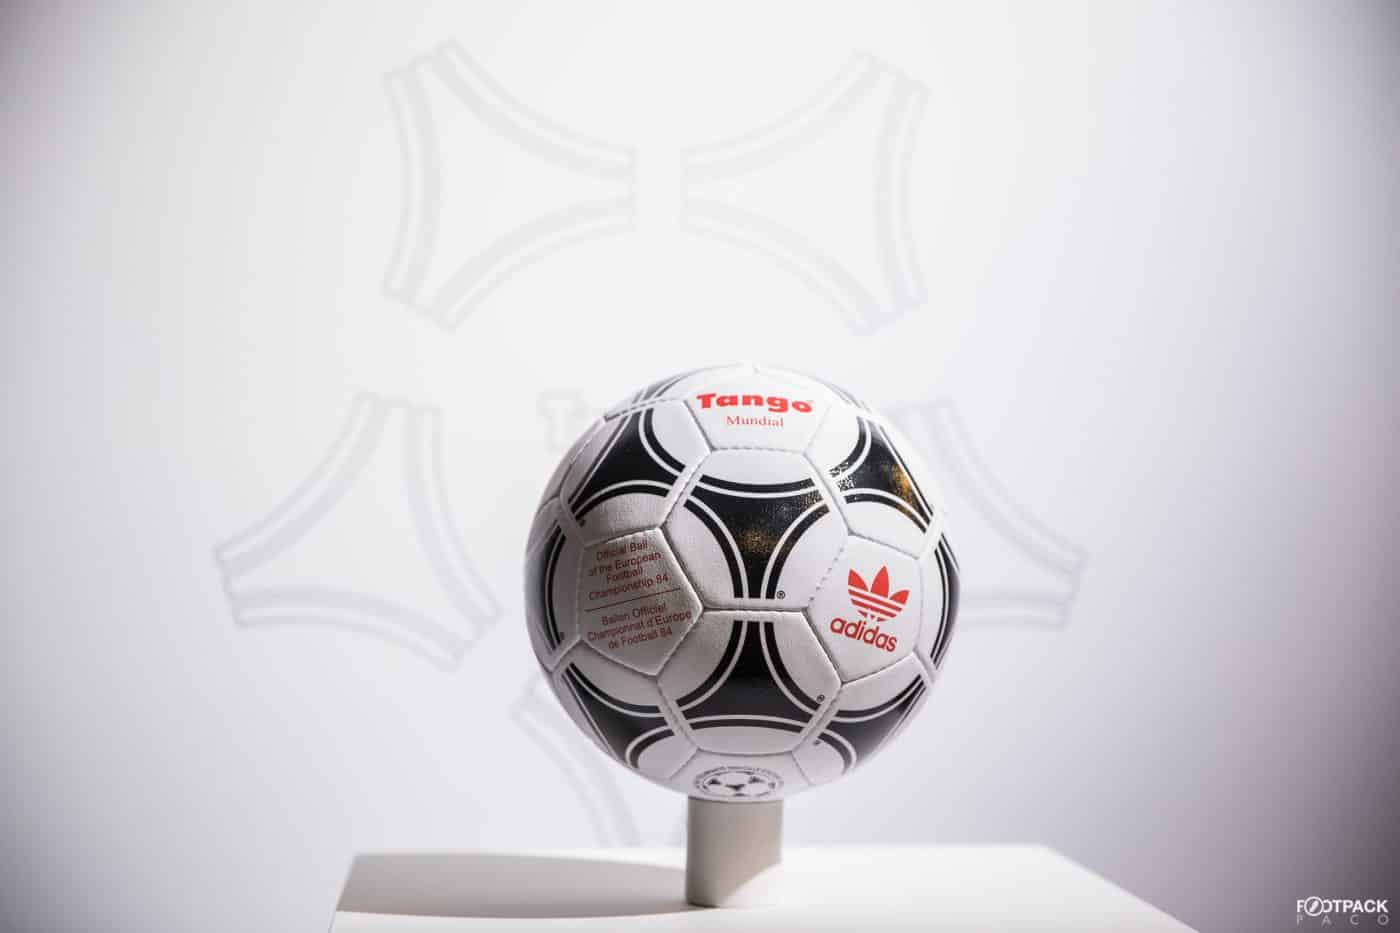 ballon-football-adidas-euro-1984-footpack-2019-2